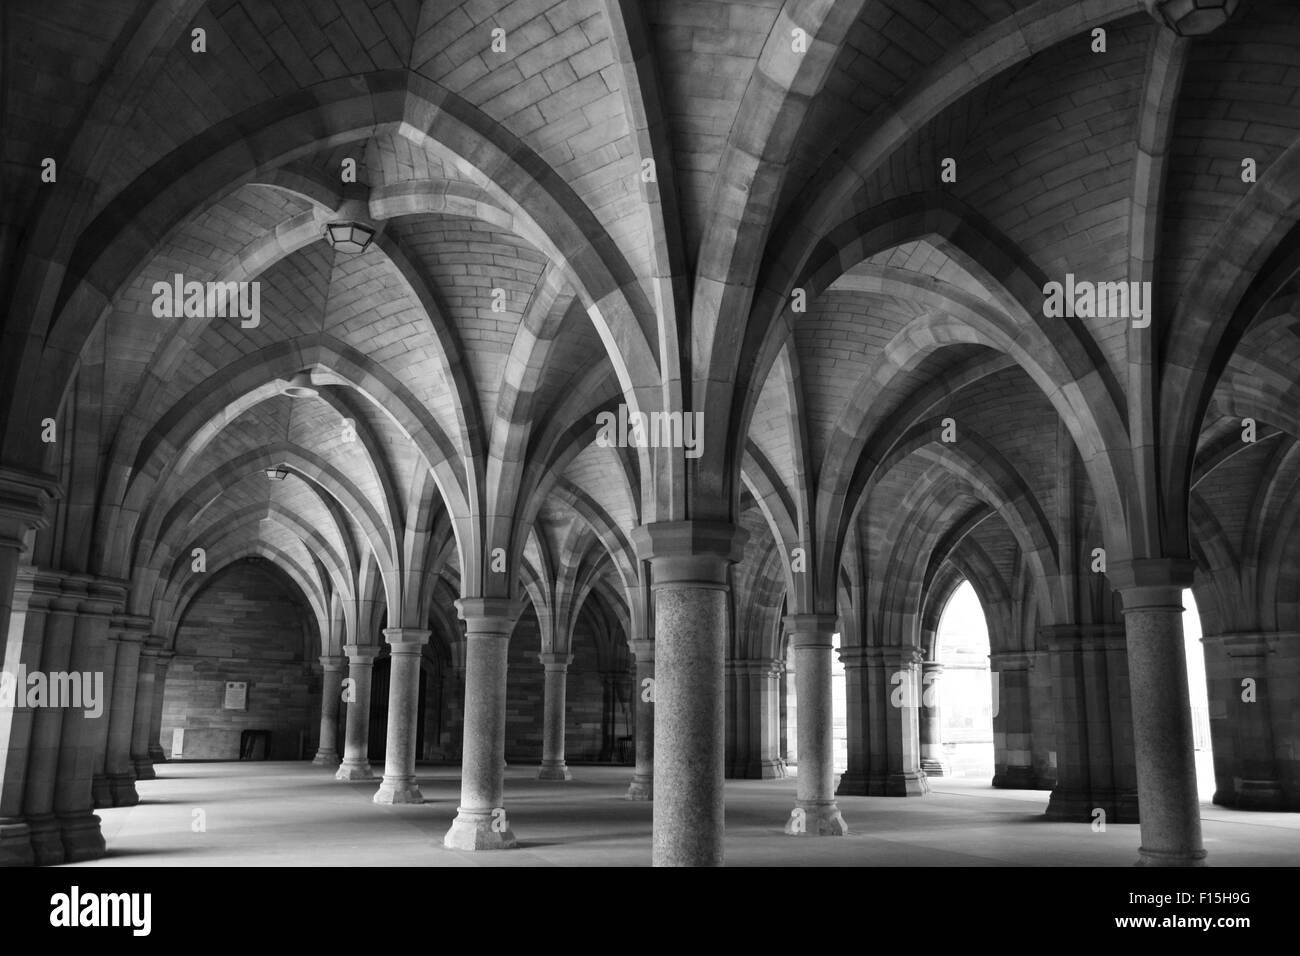 Glasgow University Cloisters - Stock Image